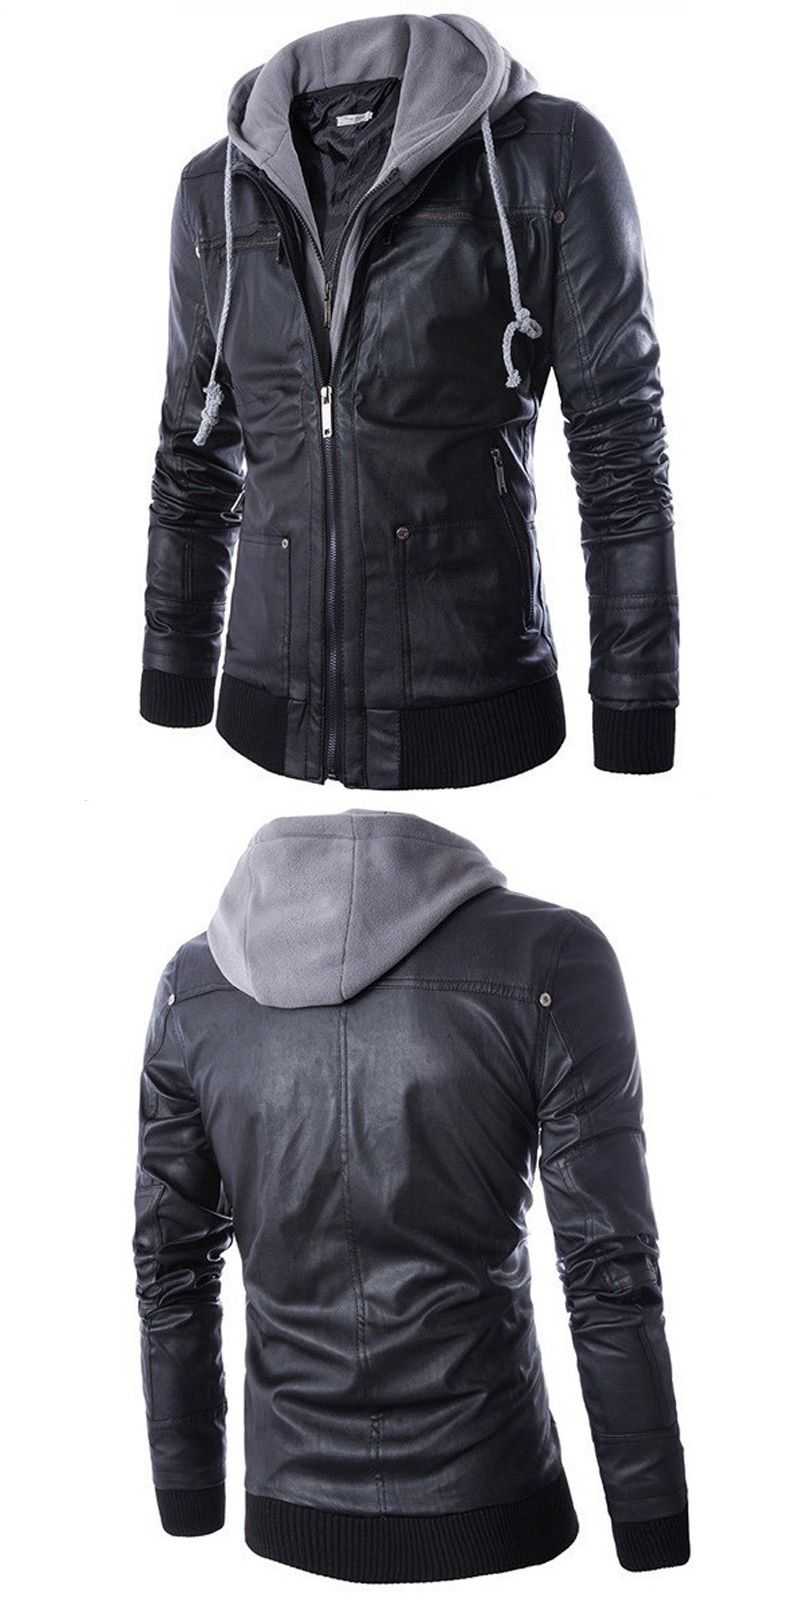 22beaf65109 Motorcycle Leather Jackets Men Leather Clothing Men Leather Jackets Male  hooded Coats